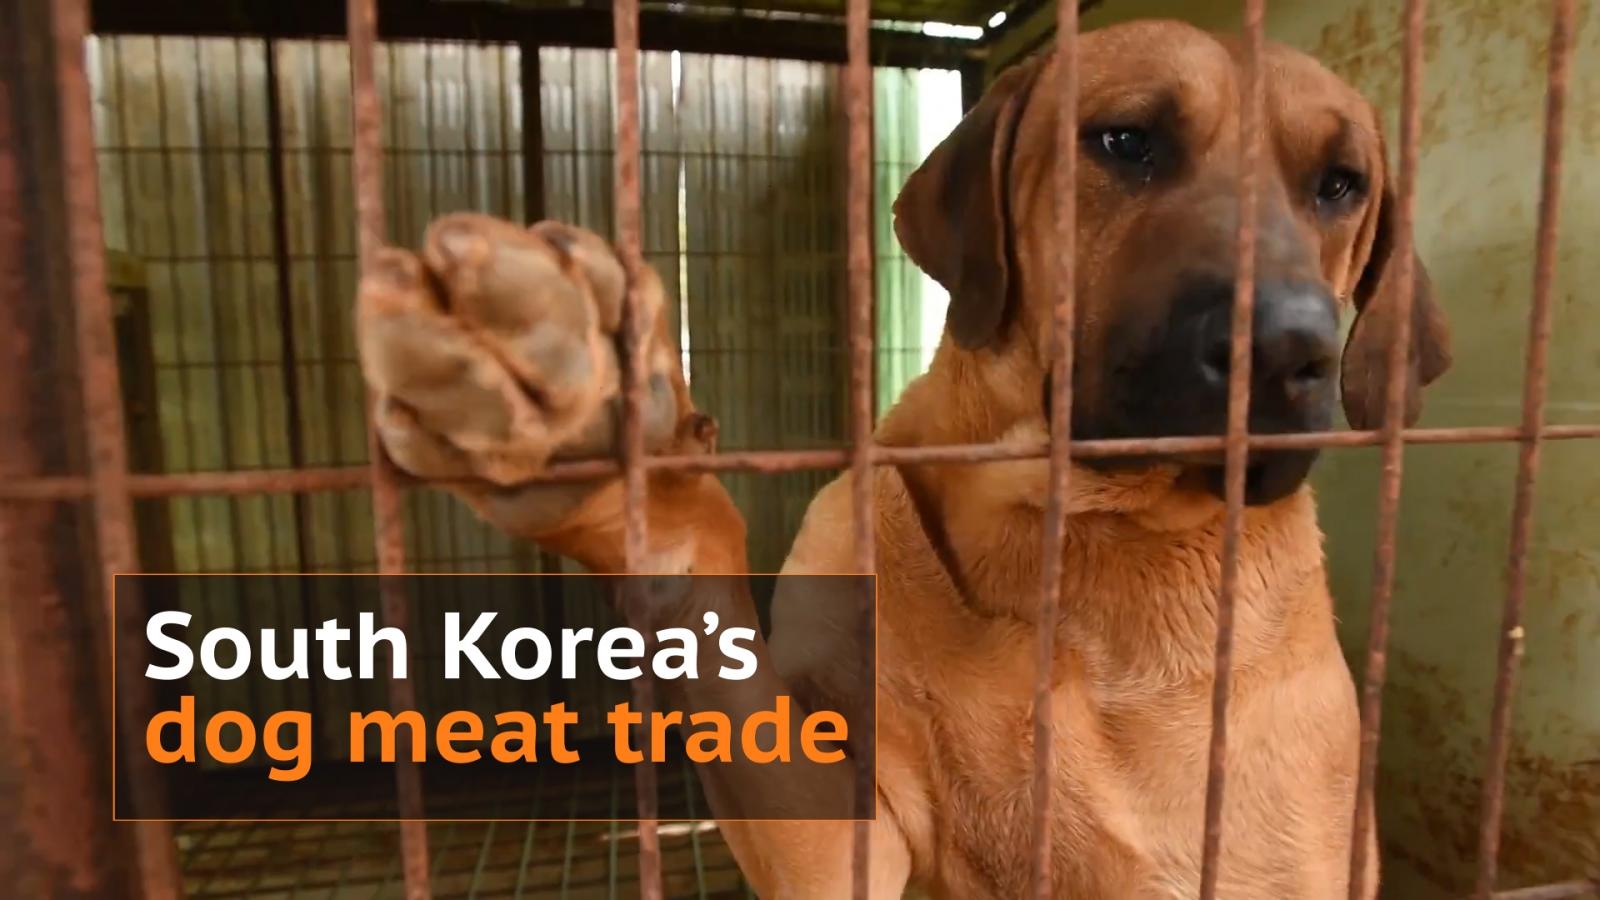 South Korea's dog meat trade